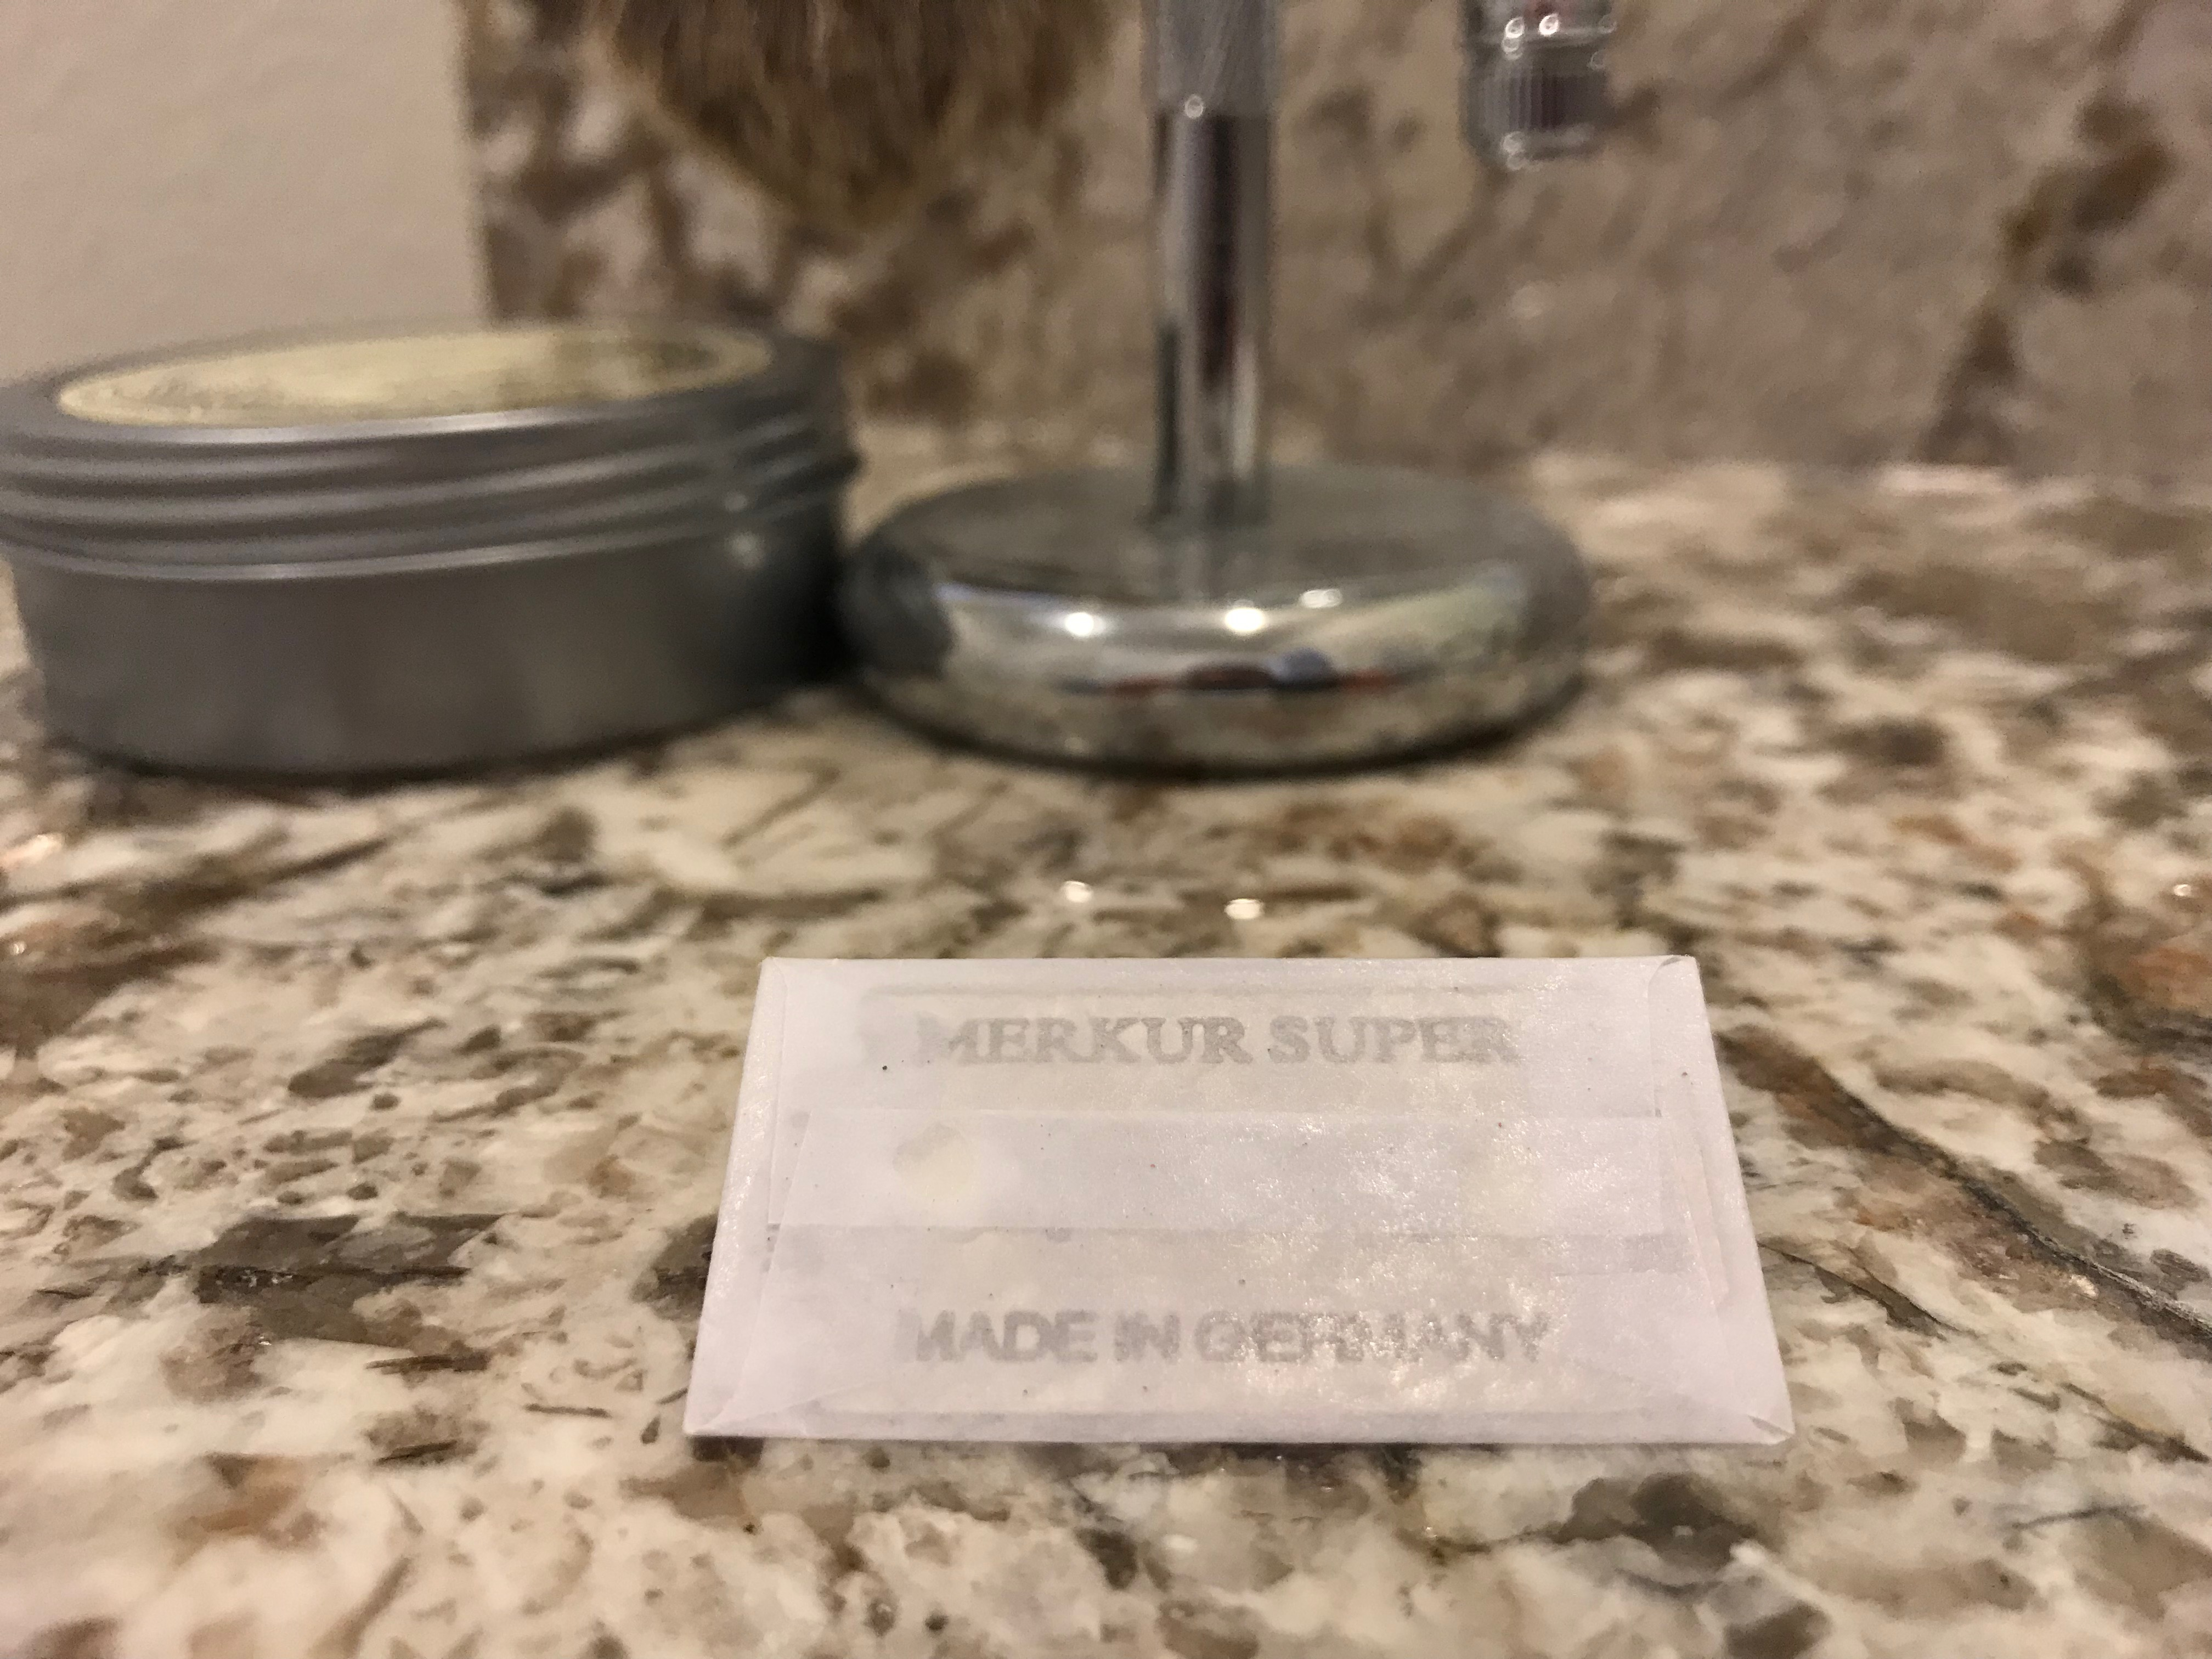 Merkur Double Edge Razor Blades Review